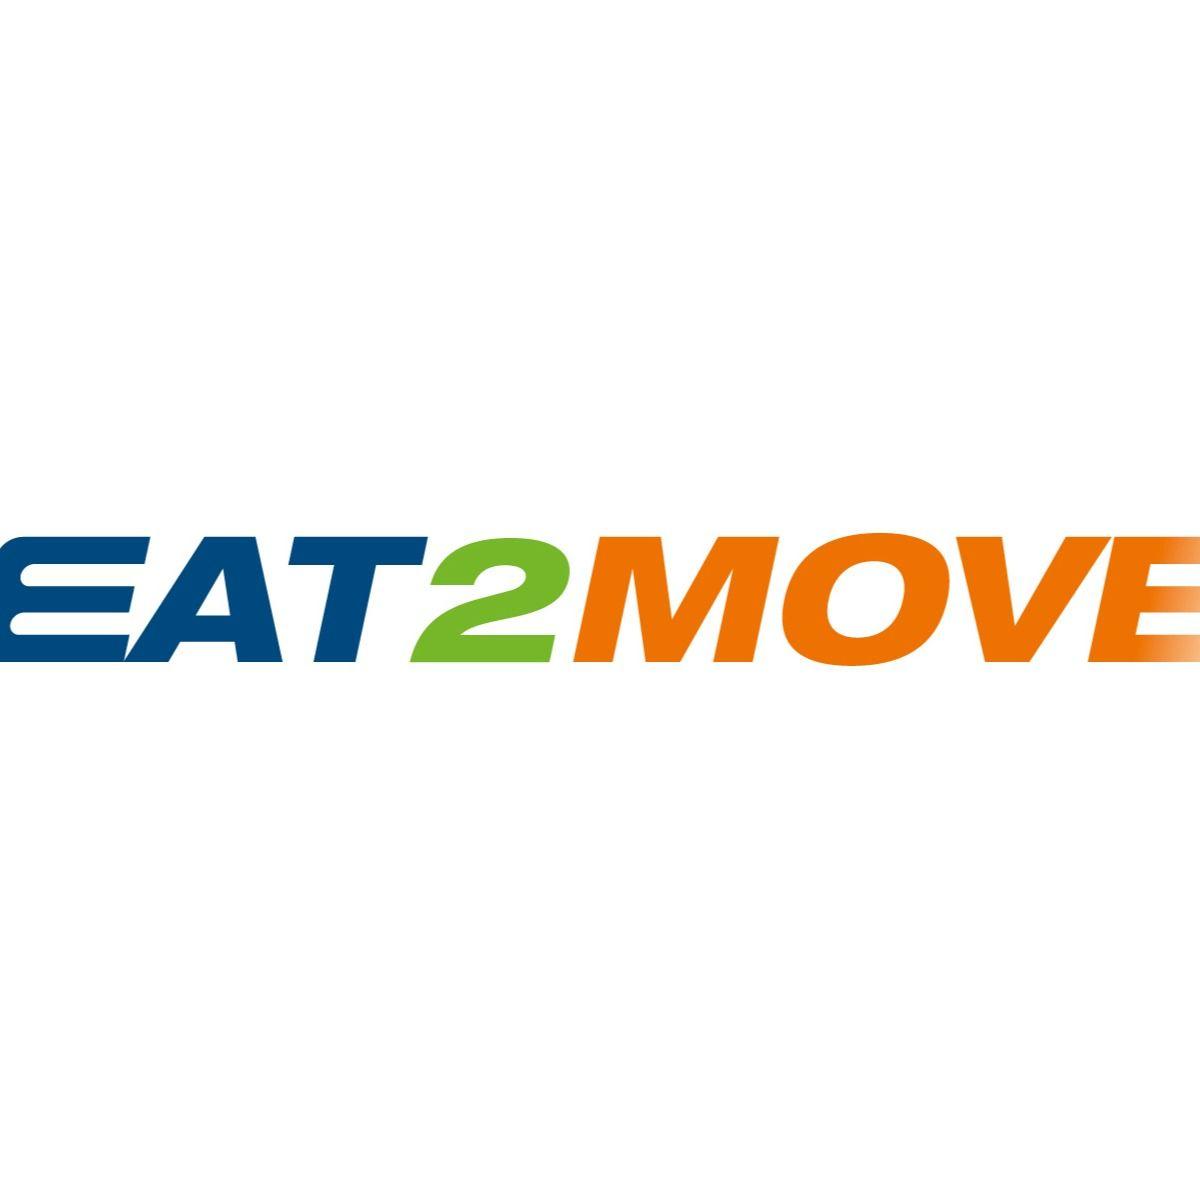 Eat2Move